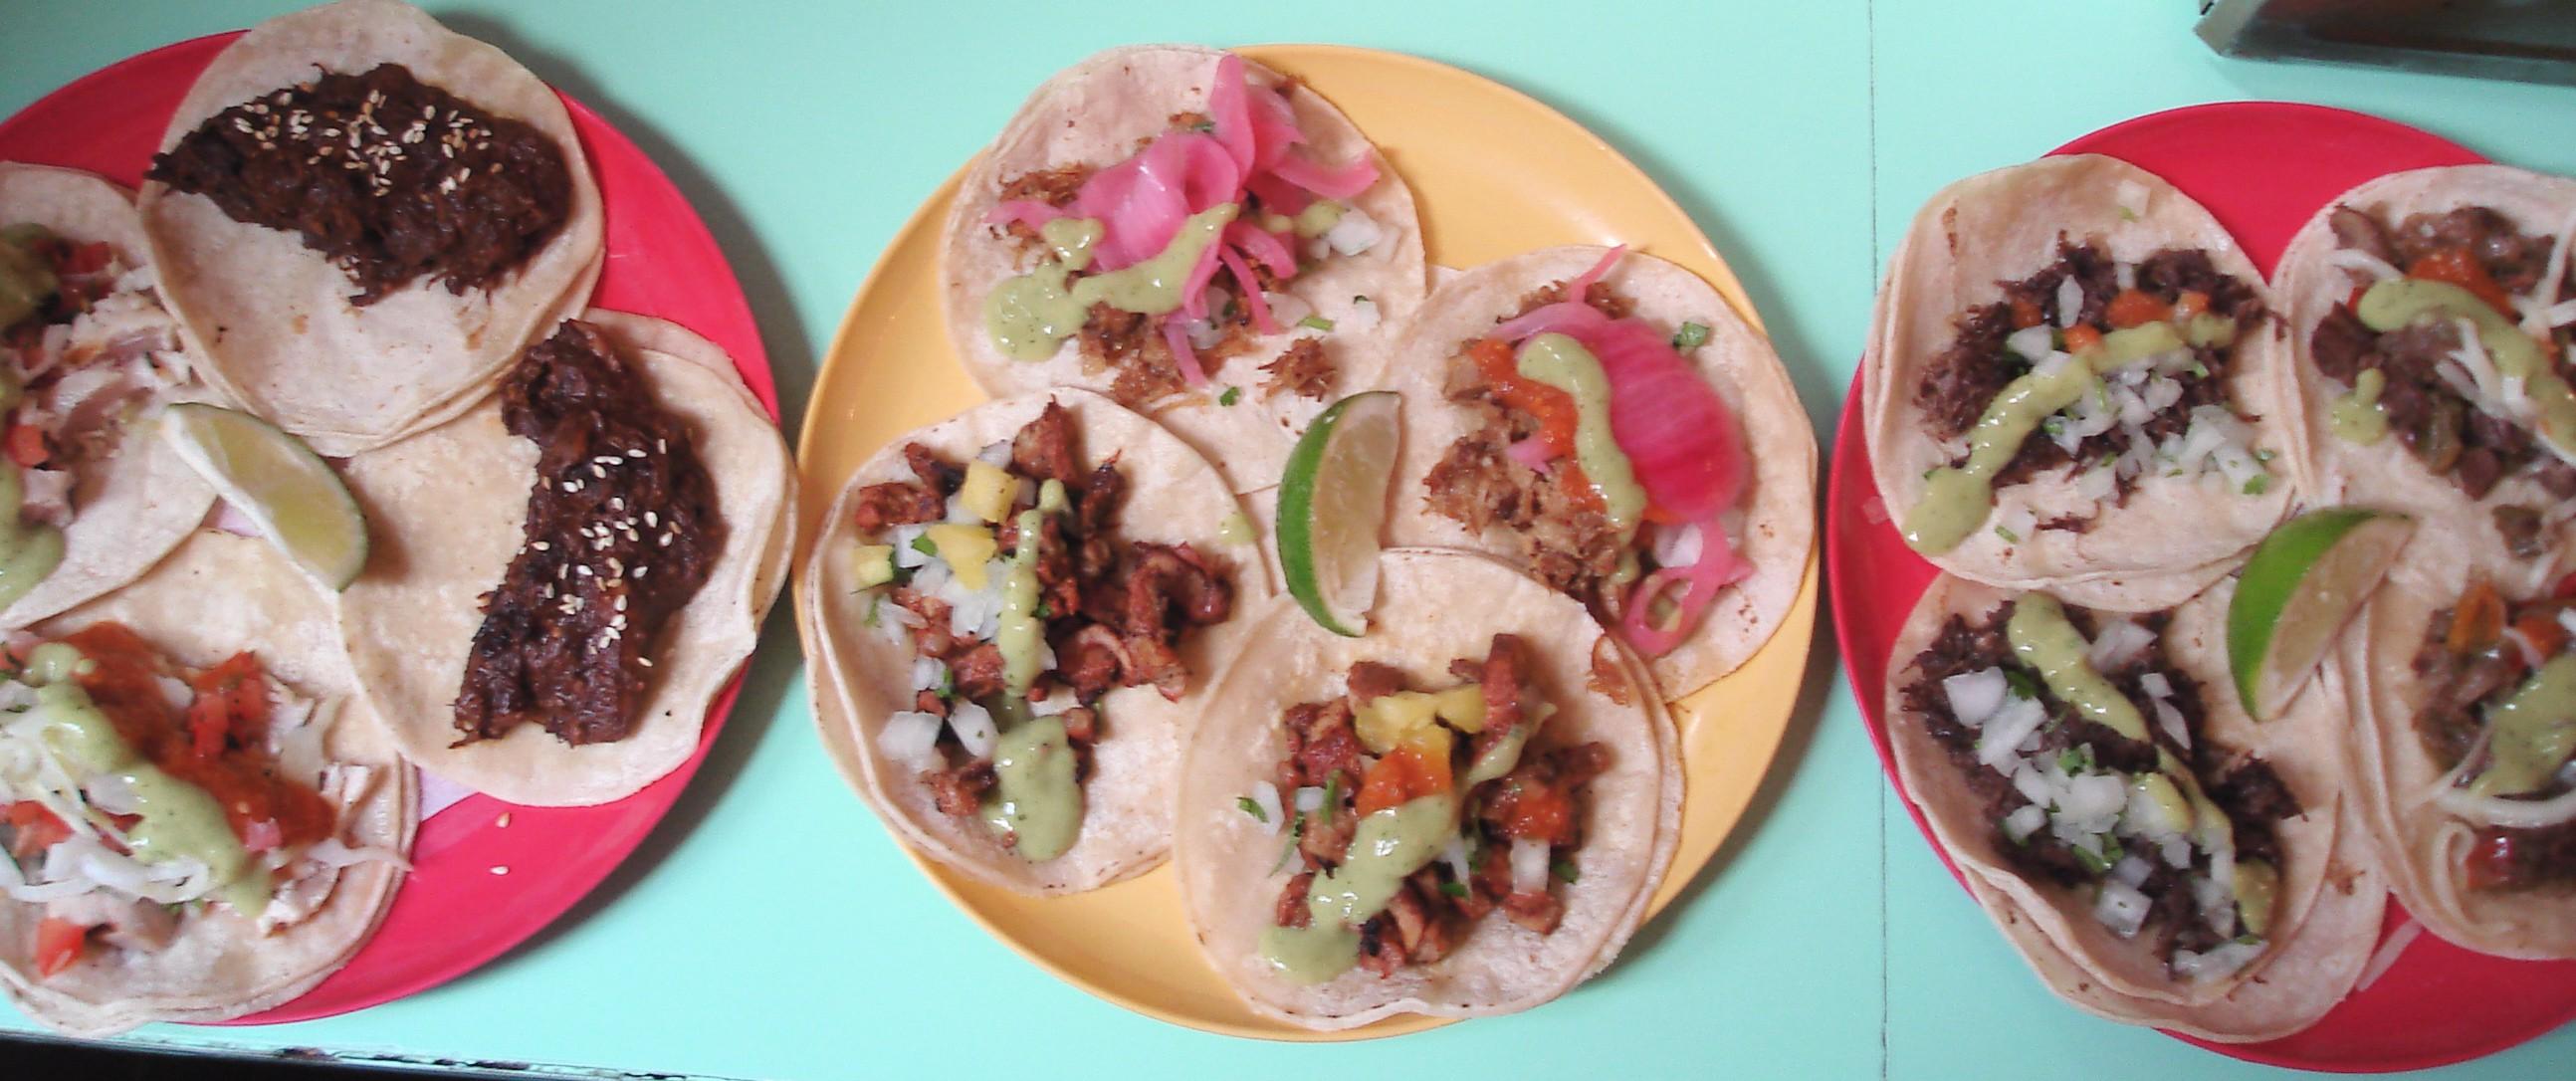 Tacos | © Vancouver Bites!/Flickr